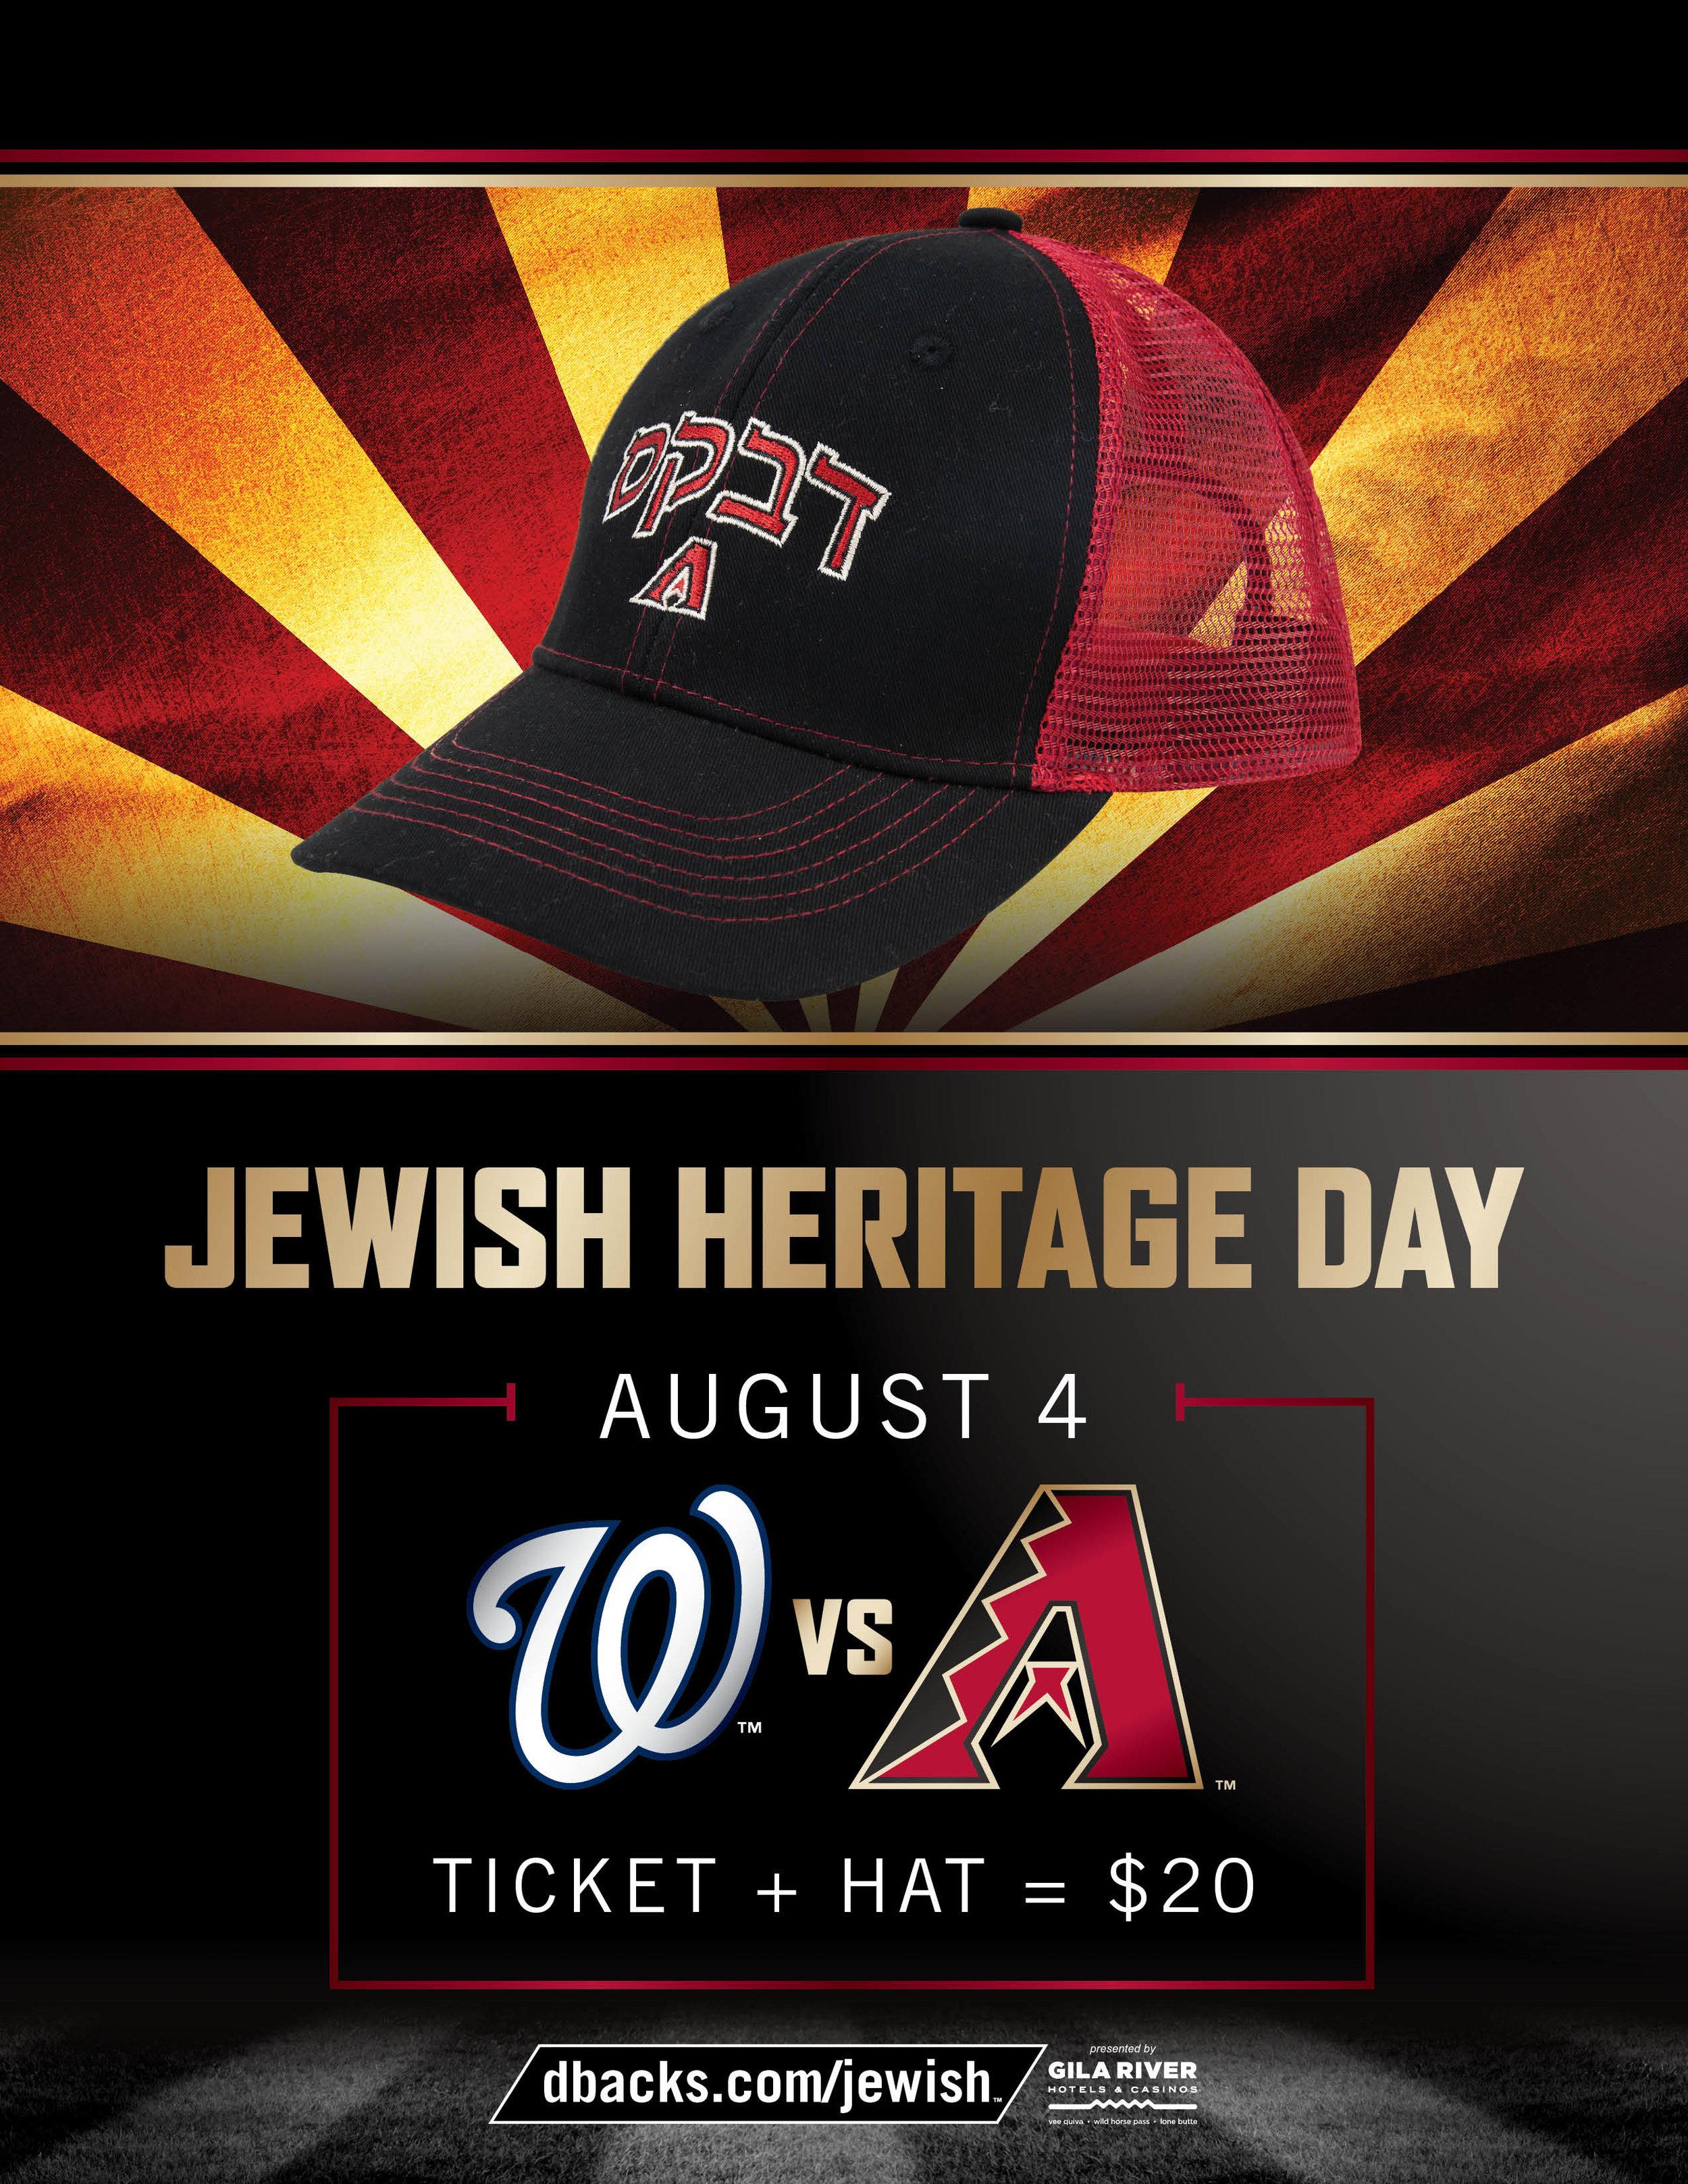 ST35-071914 Jewish Heritage ads 8.5x11 PRESS (1).jpg